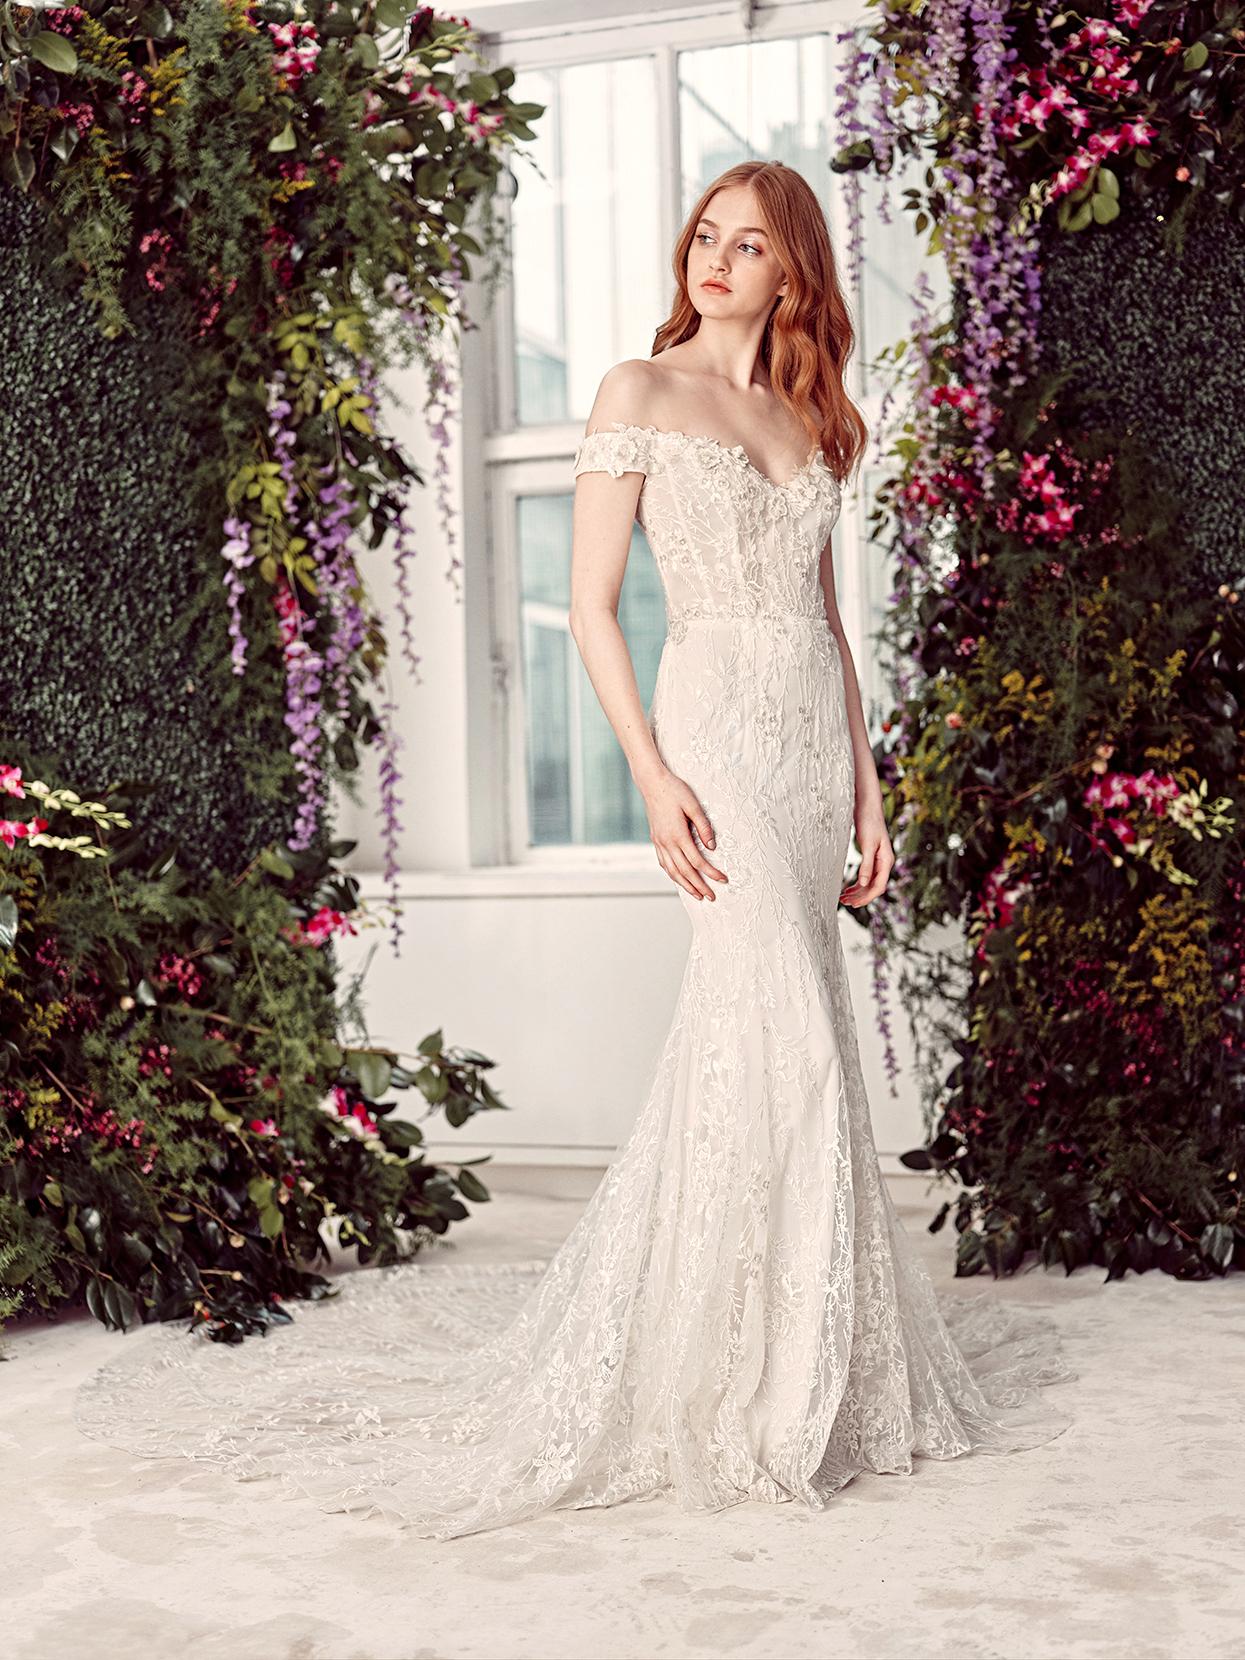 alyne by rita vinieris off-the-shoulder embroidered wedding dress spring 2020